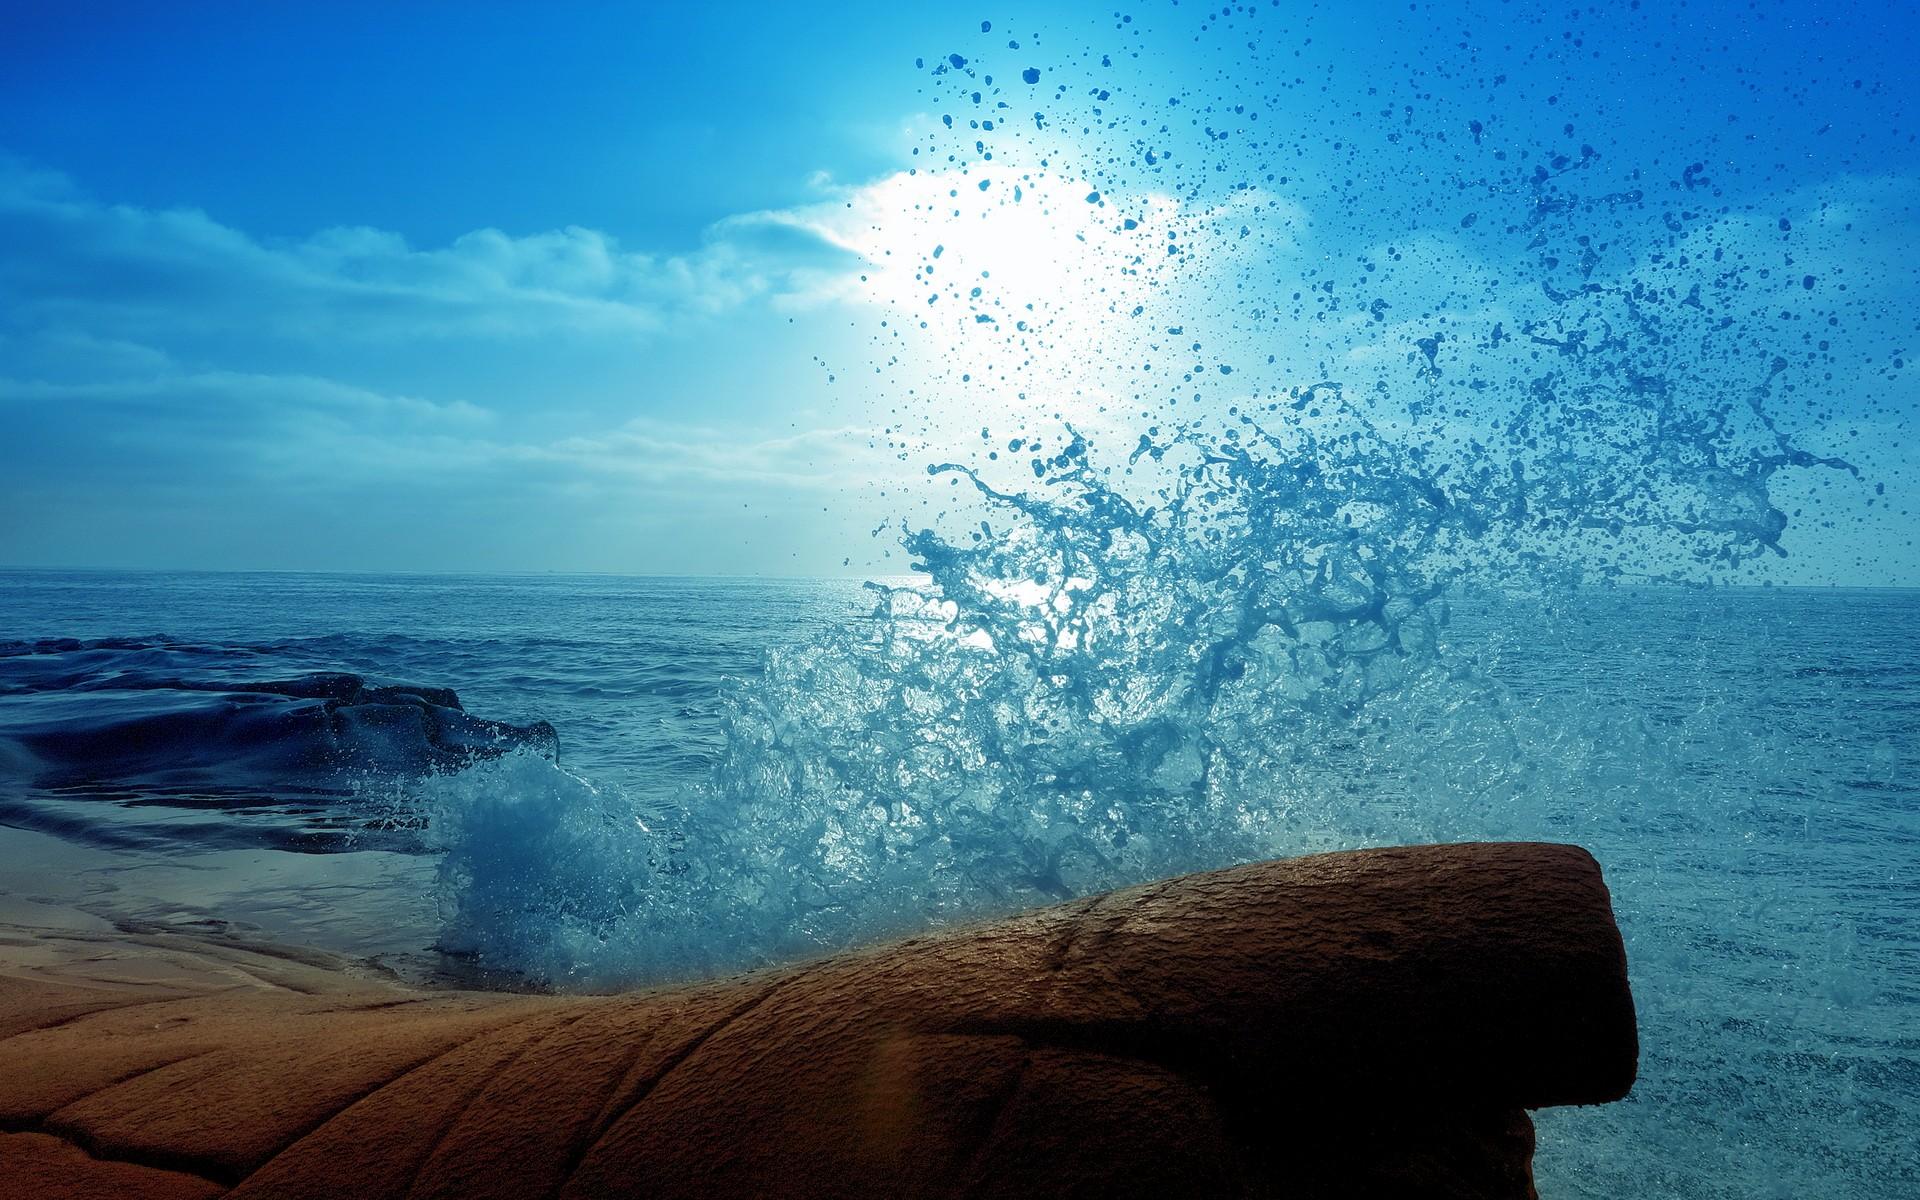 Splash Ocean Water Drops Blue waves wallpaper 1920x1200 1920x1200